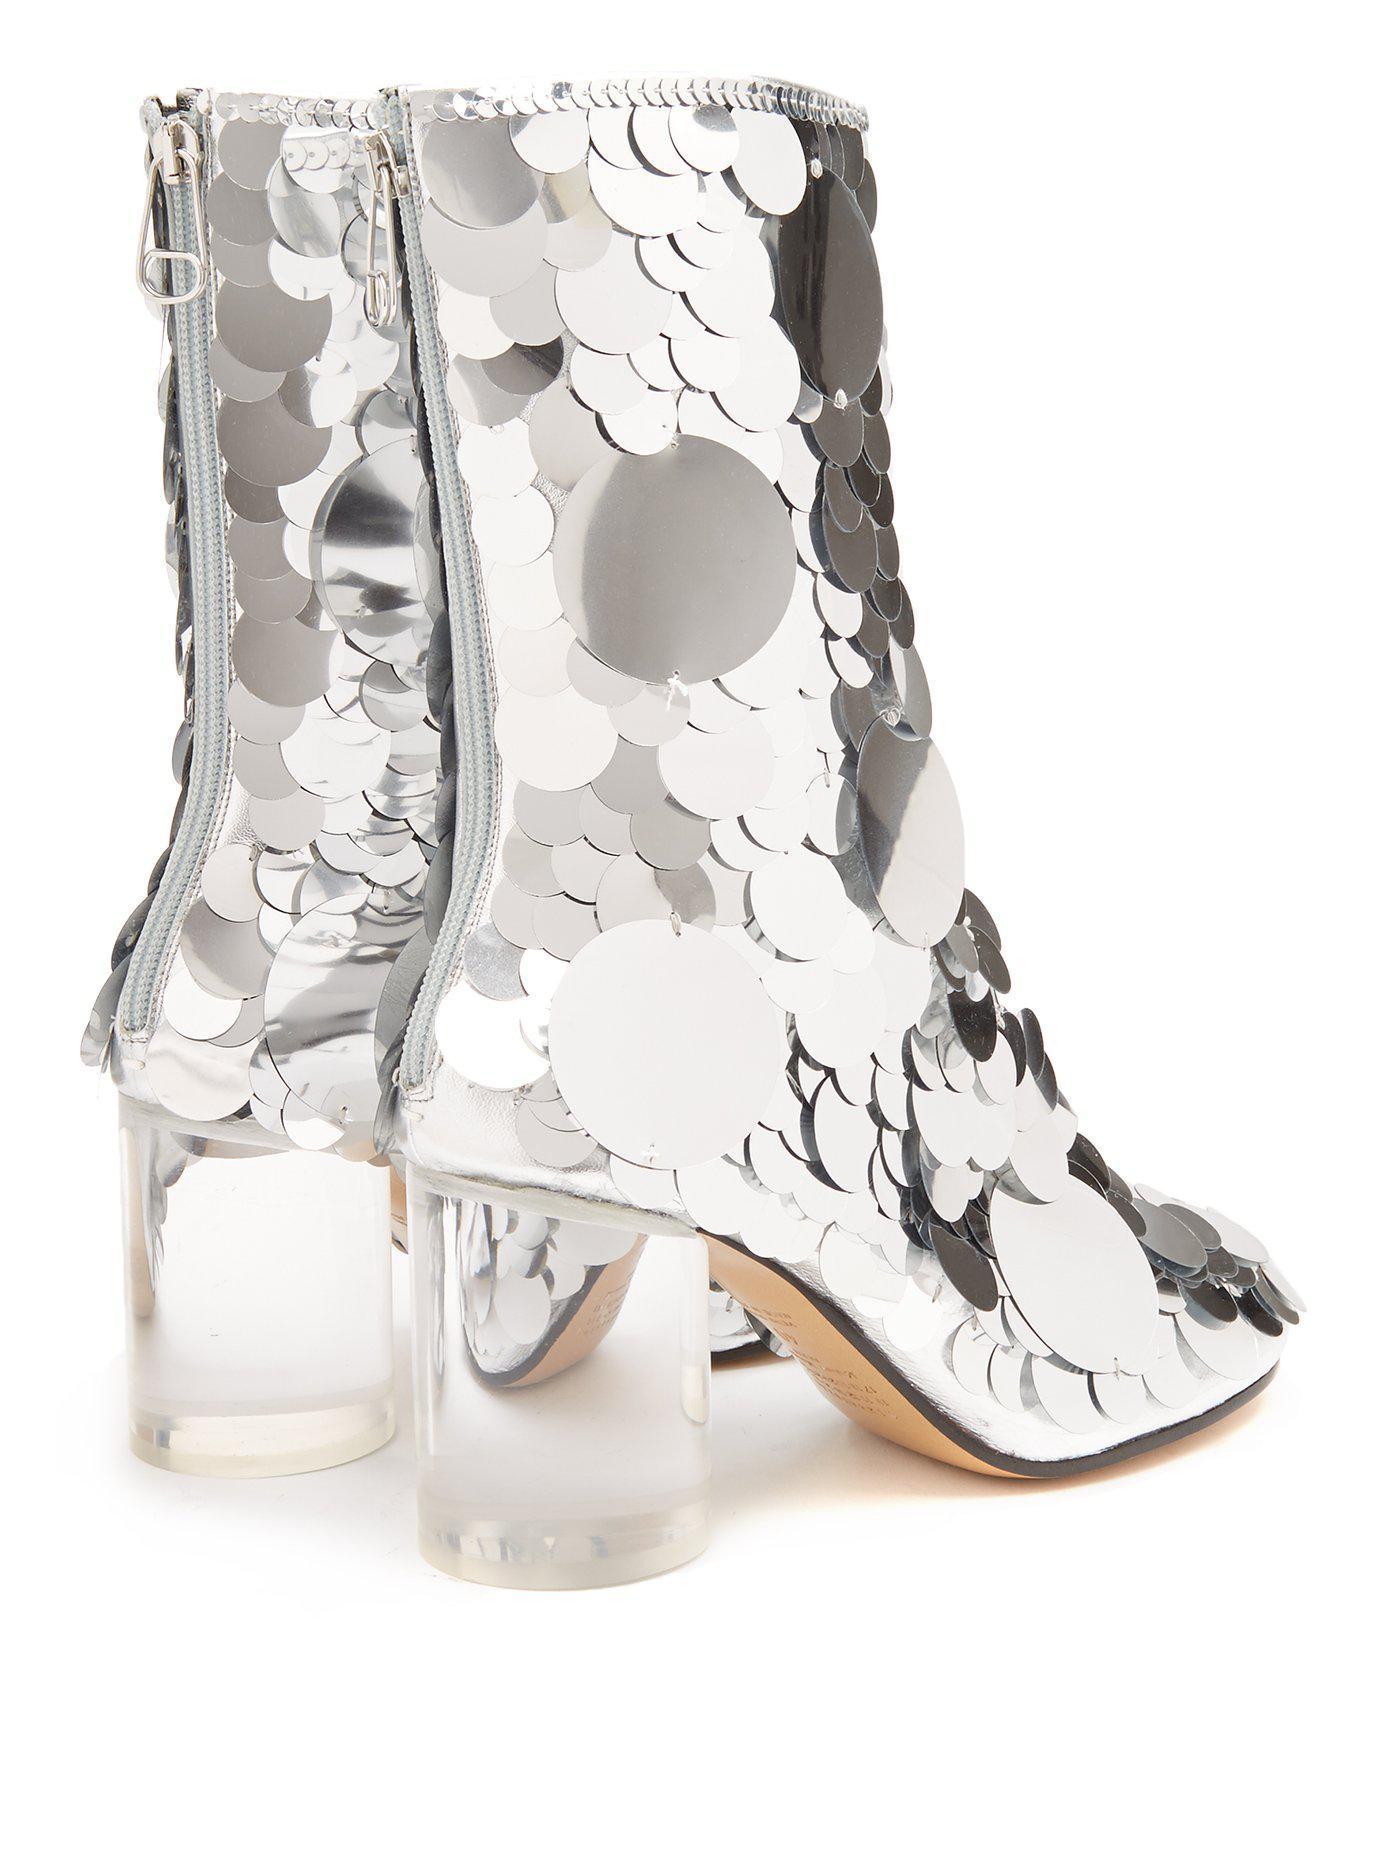 MM6 MAISON MARGIELA Sequin embellished ankle boots